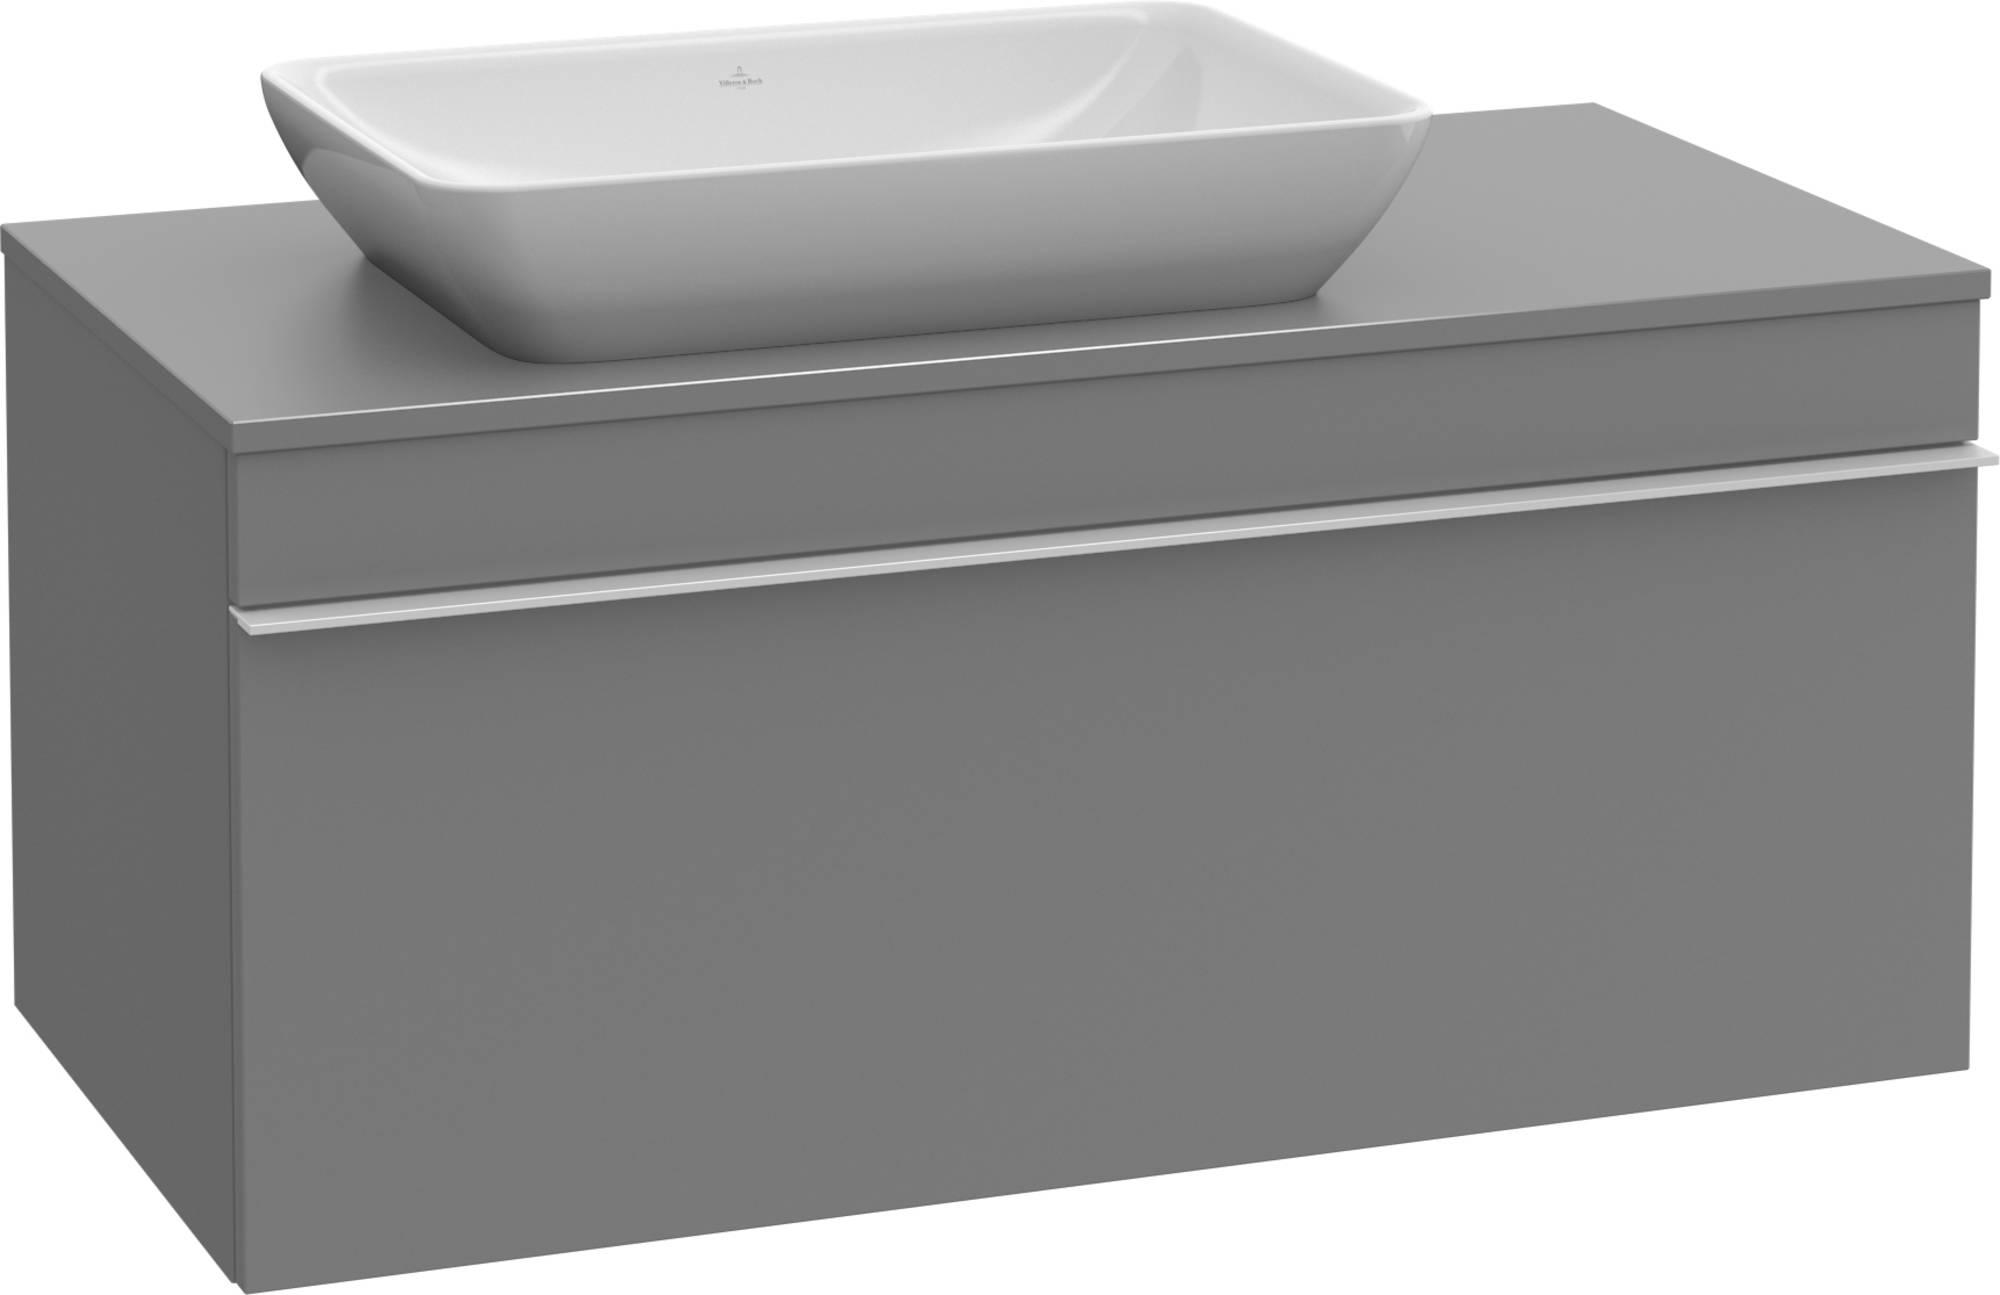 Villeroy&Boch Venticello Wastafelonderkast 95,7x50,2x43,6  cm Iep Impresso